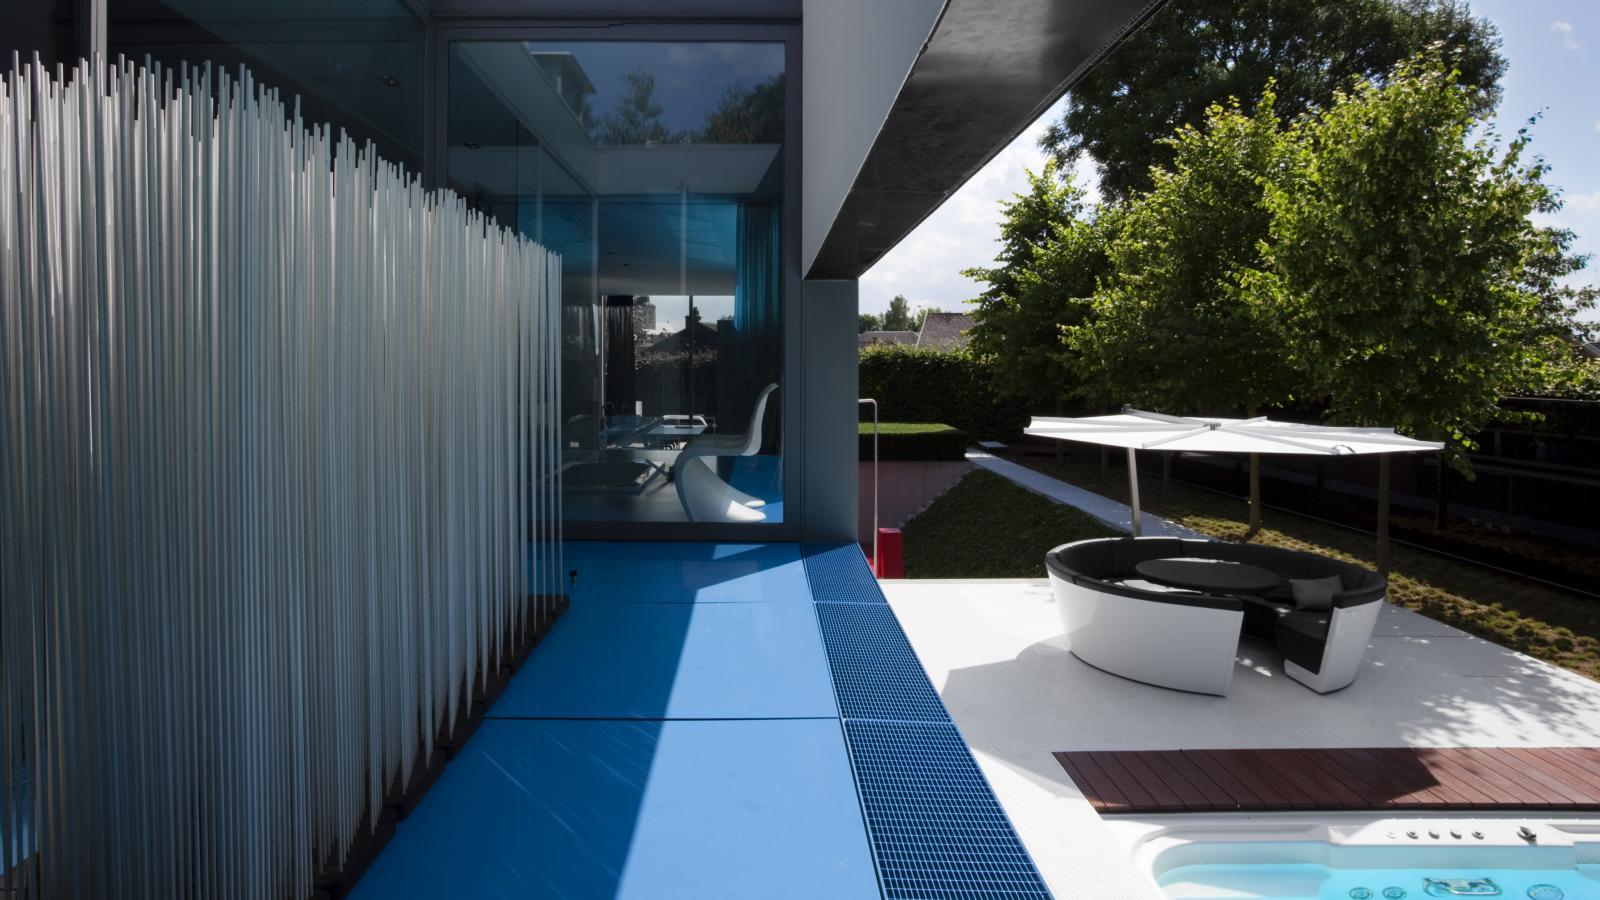 feelathome stockverkoop extremis sticks wit. Black Bedroom Furniture Sets. Home Design Ideas